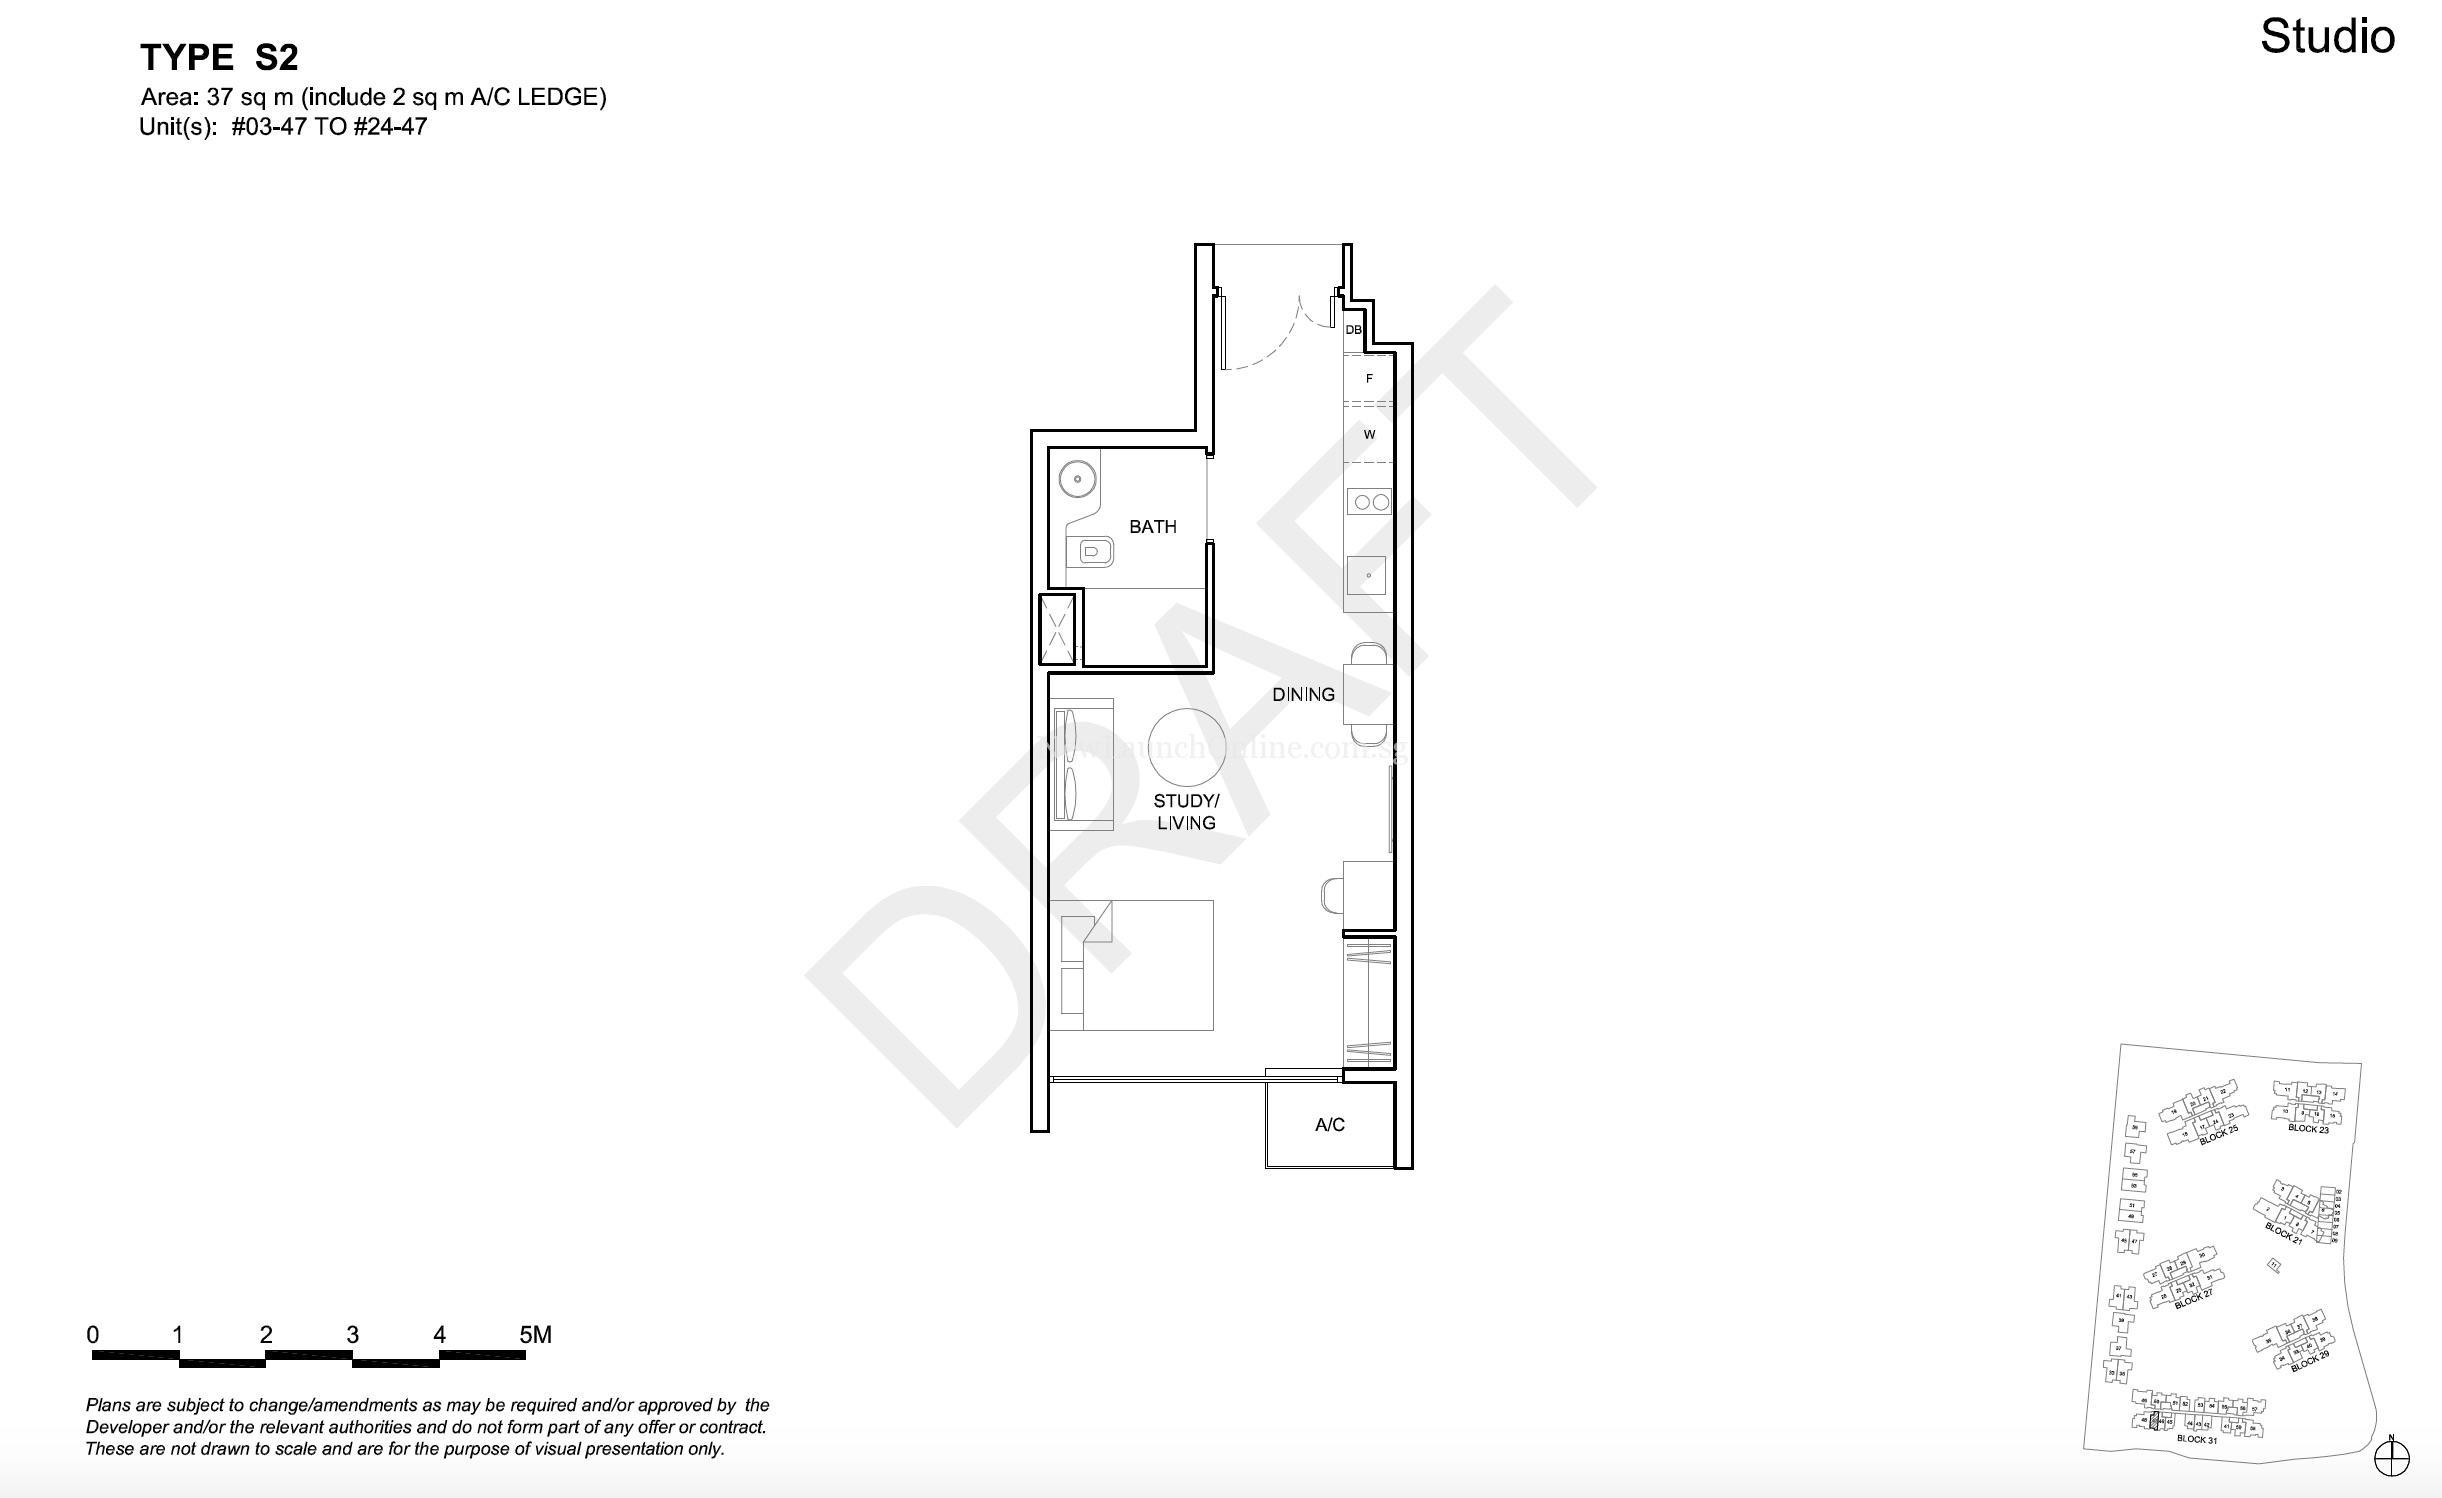 High Park Residences Floor Plan Studio Type S2